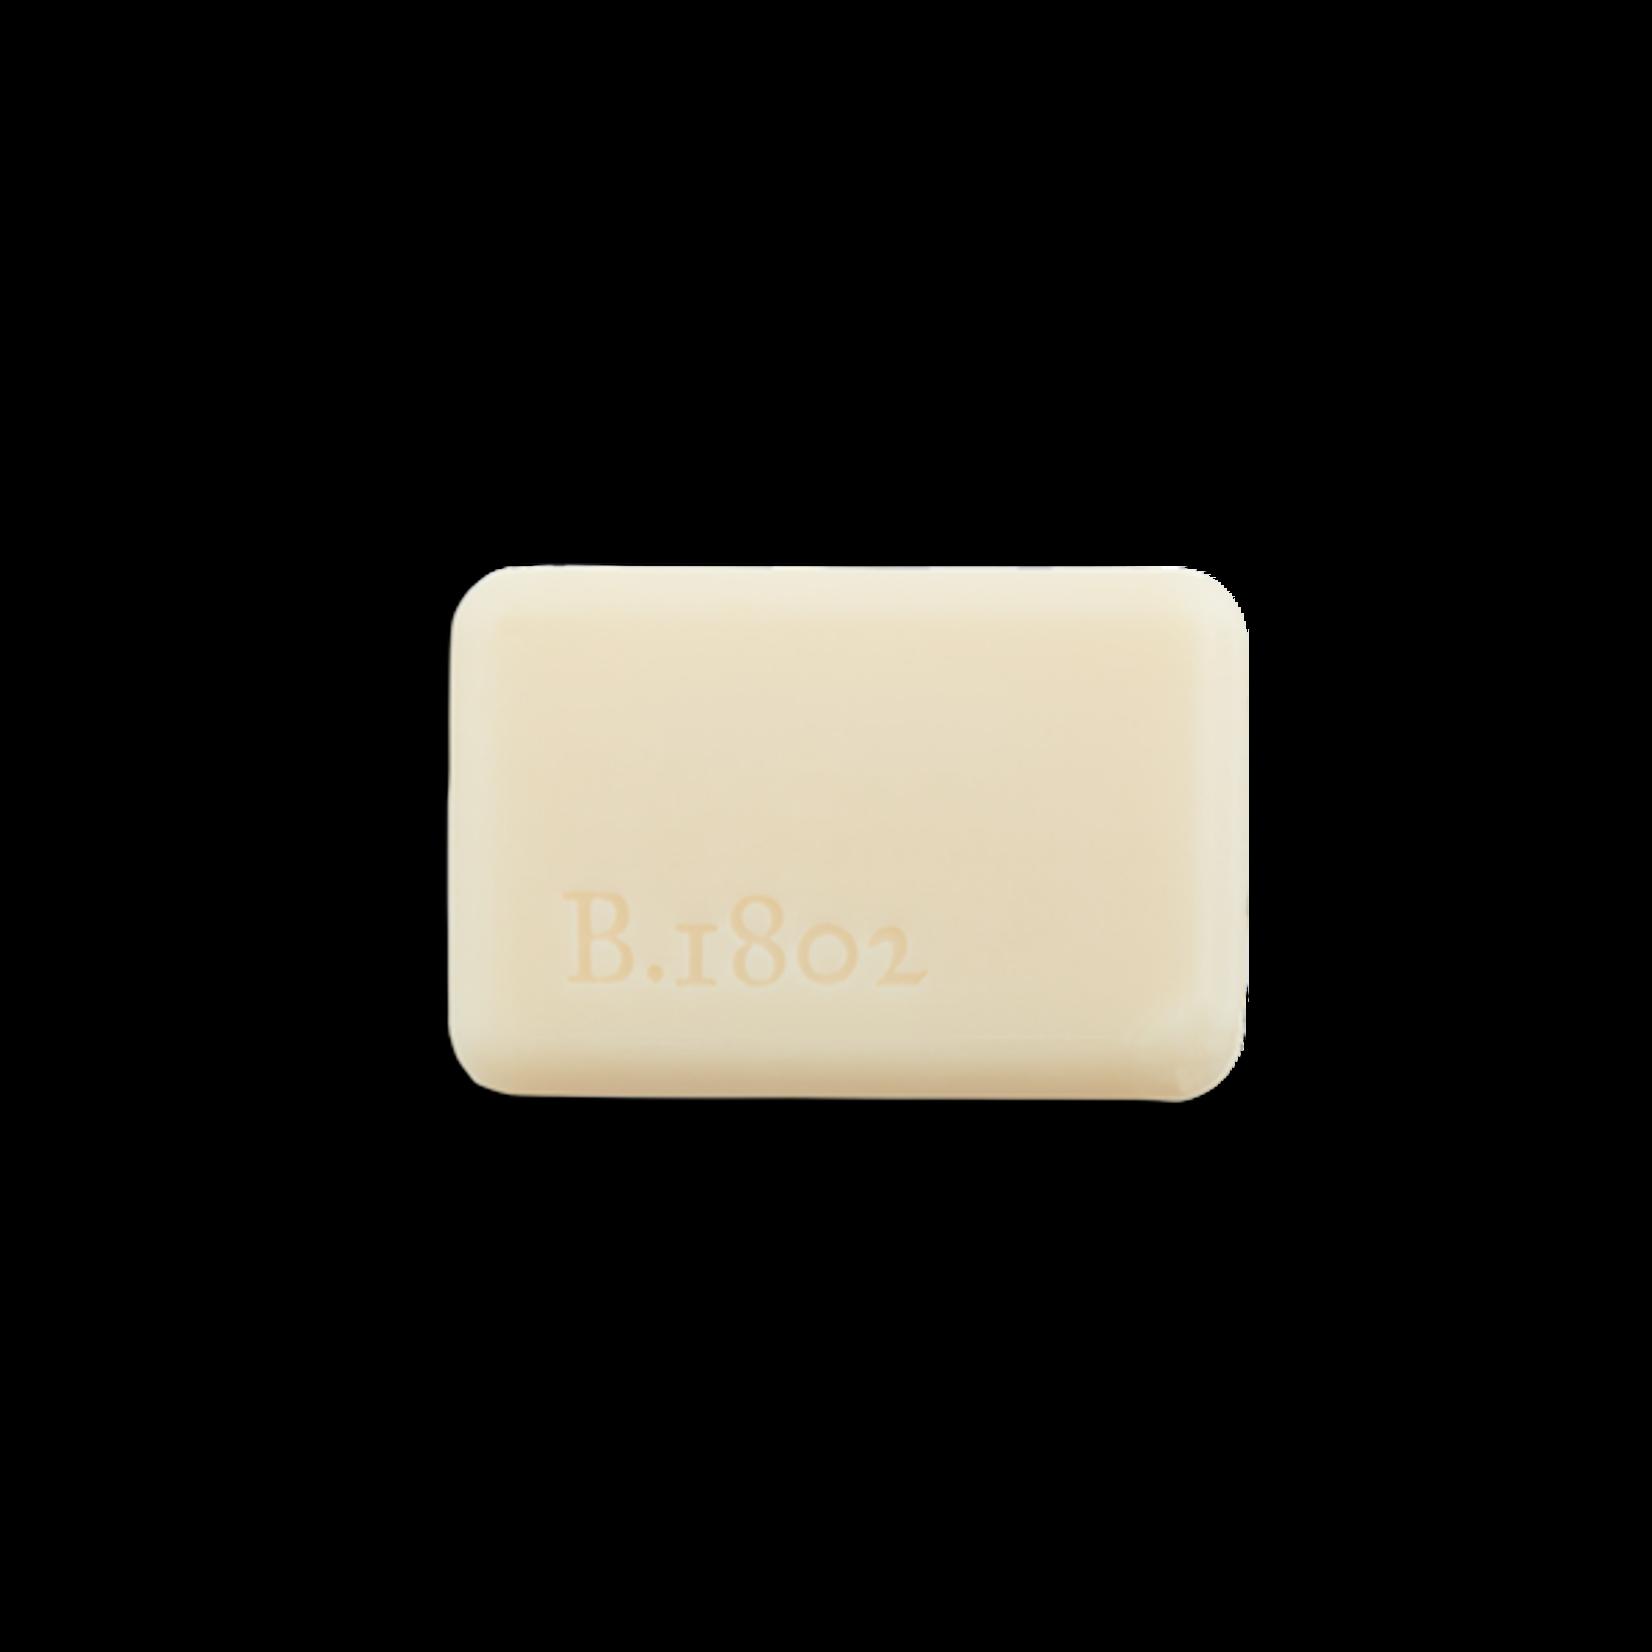 Apricot & Honey Tea 9oz Bar Soap